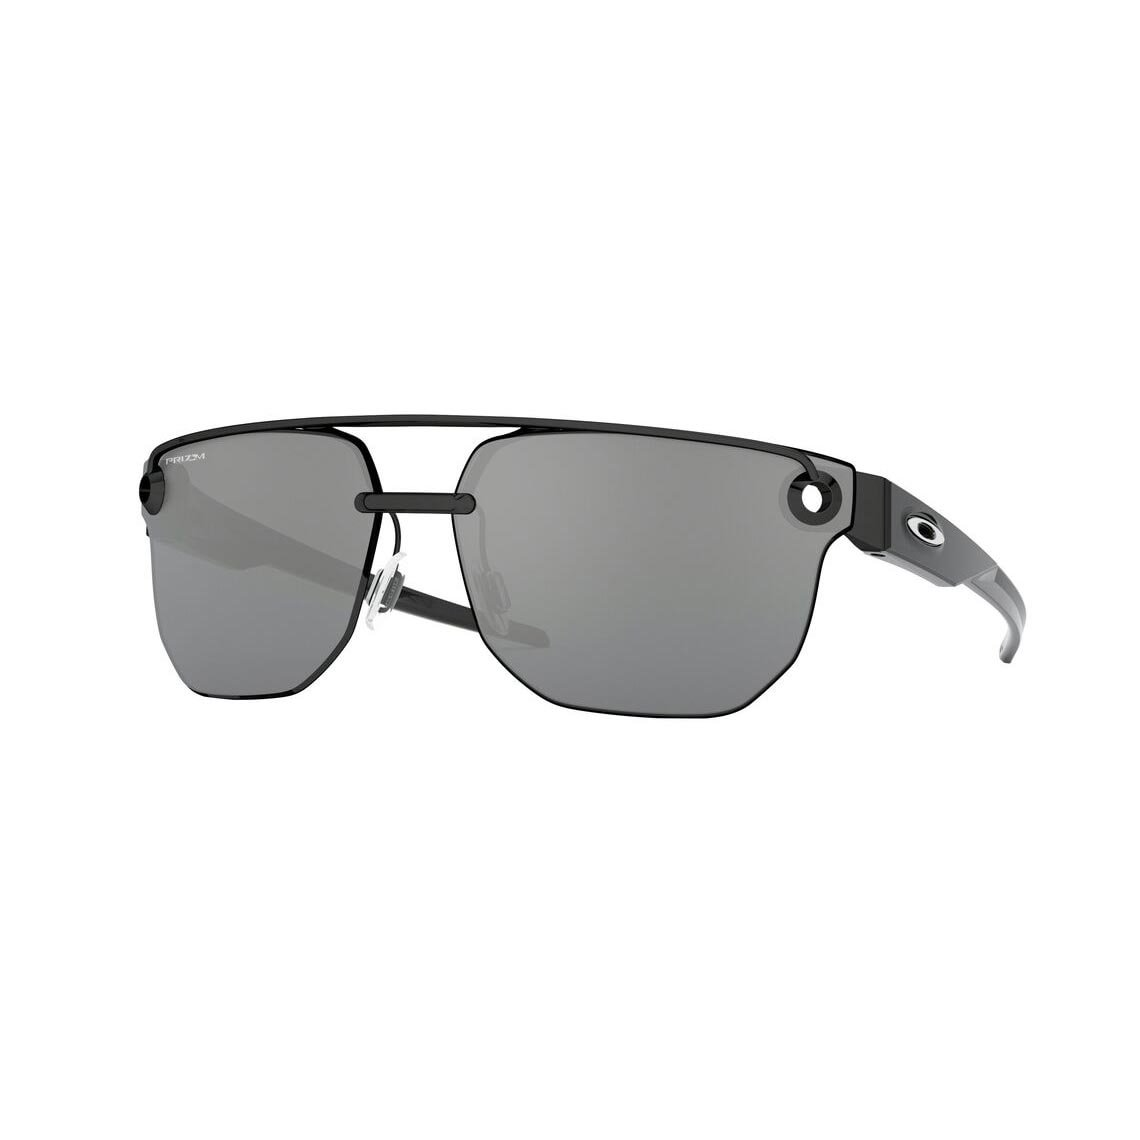 Oakley Chrystl Prizm Black OO4136-0667